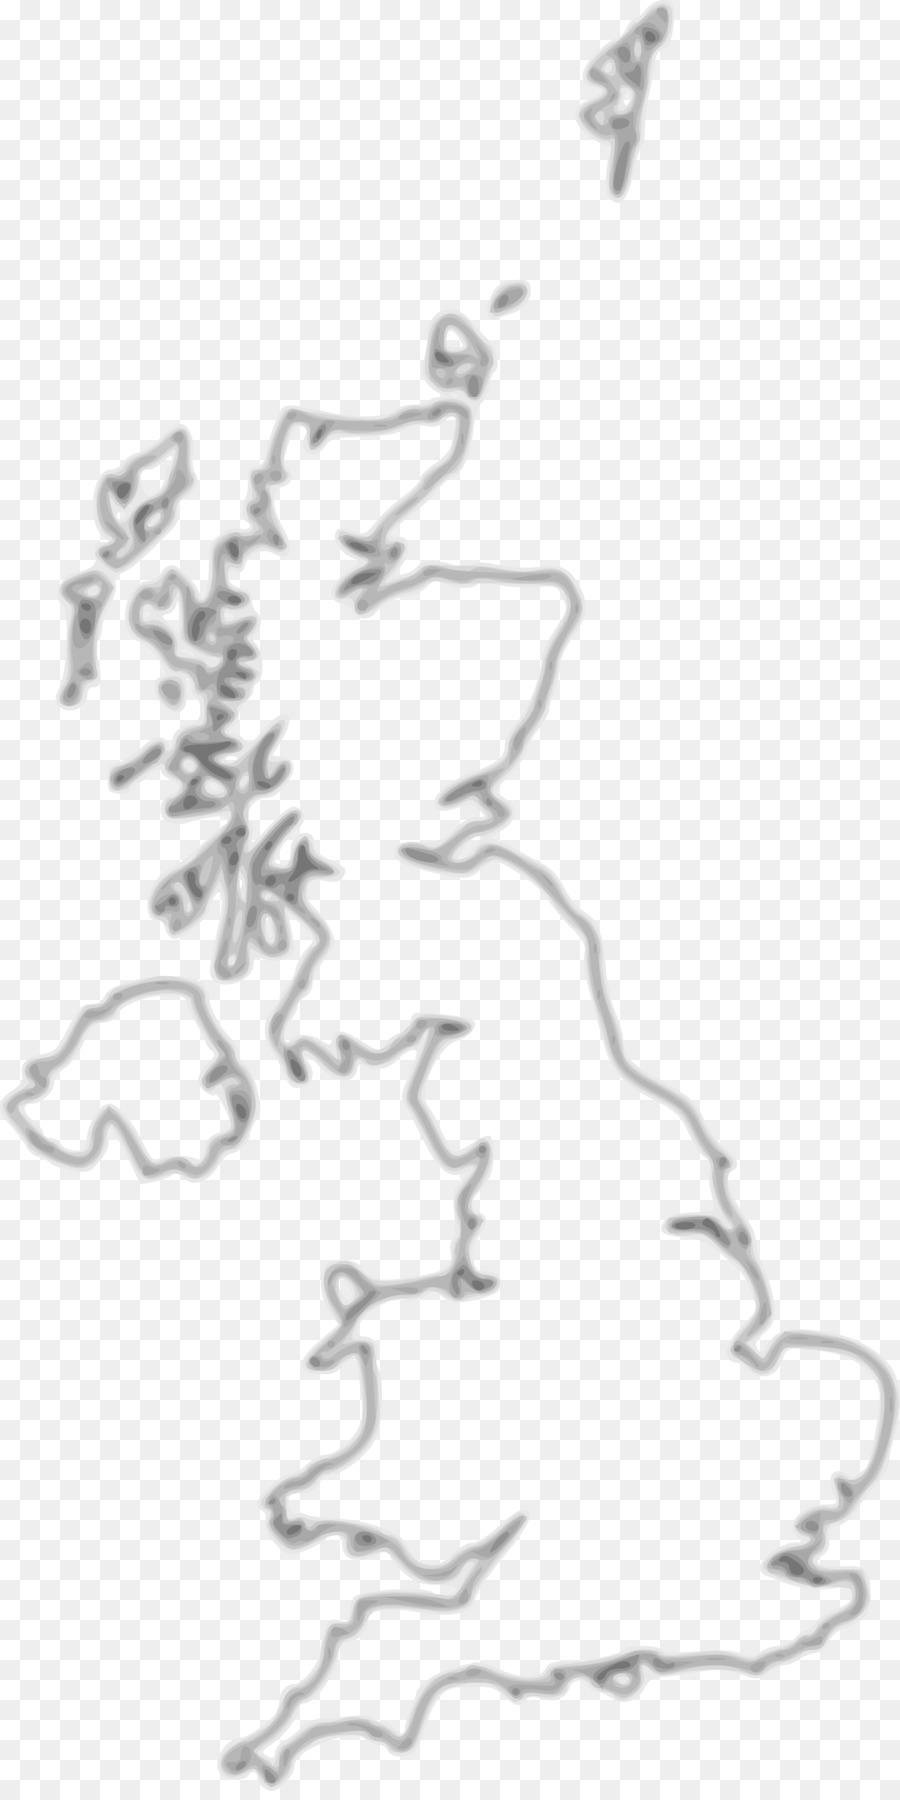 England British Isles Blank map Clip art - united kingdom png ...